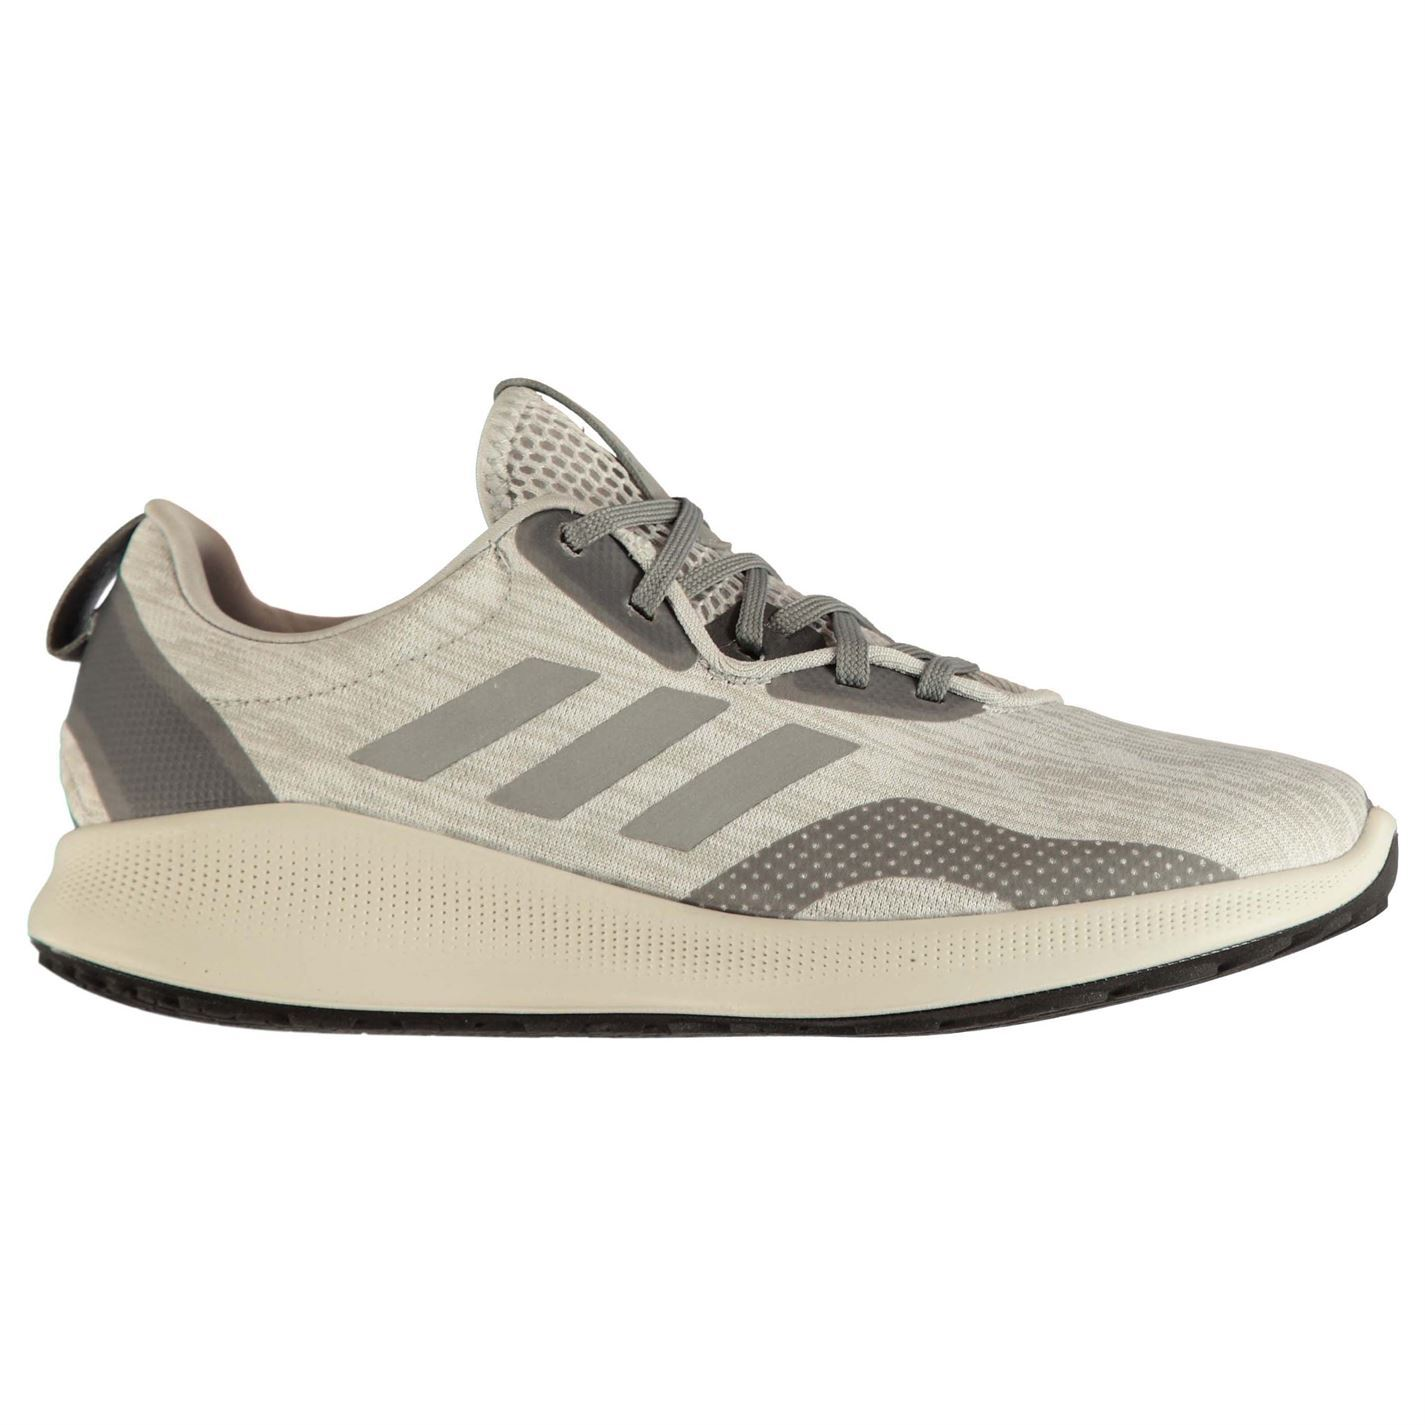 Dettagli su Adidas Purebounce + Street Scarpe da Corsa Uomo Fitness Sportive Ginnastica